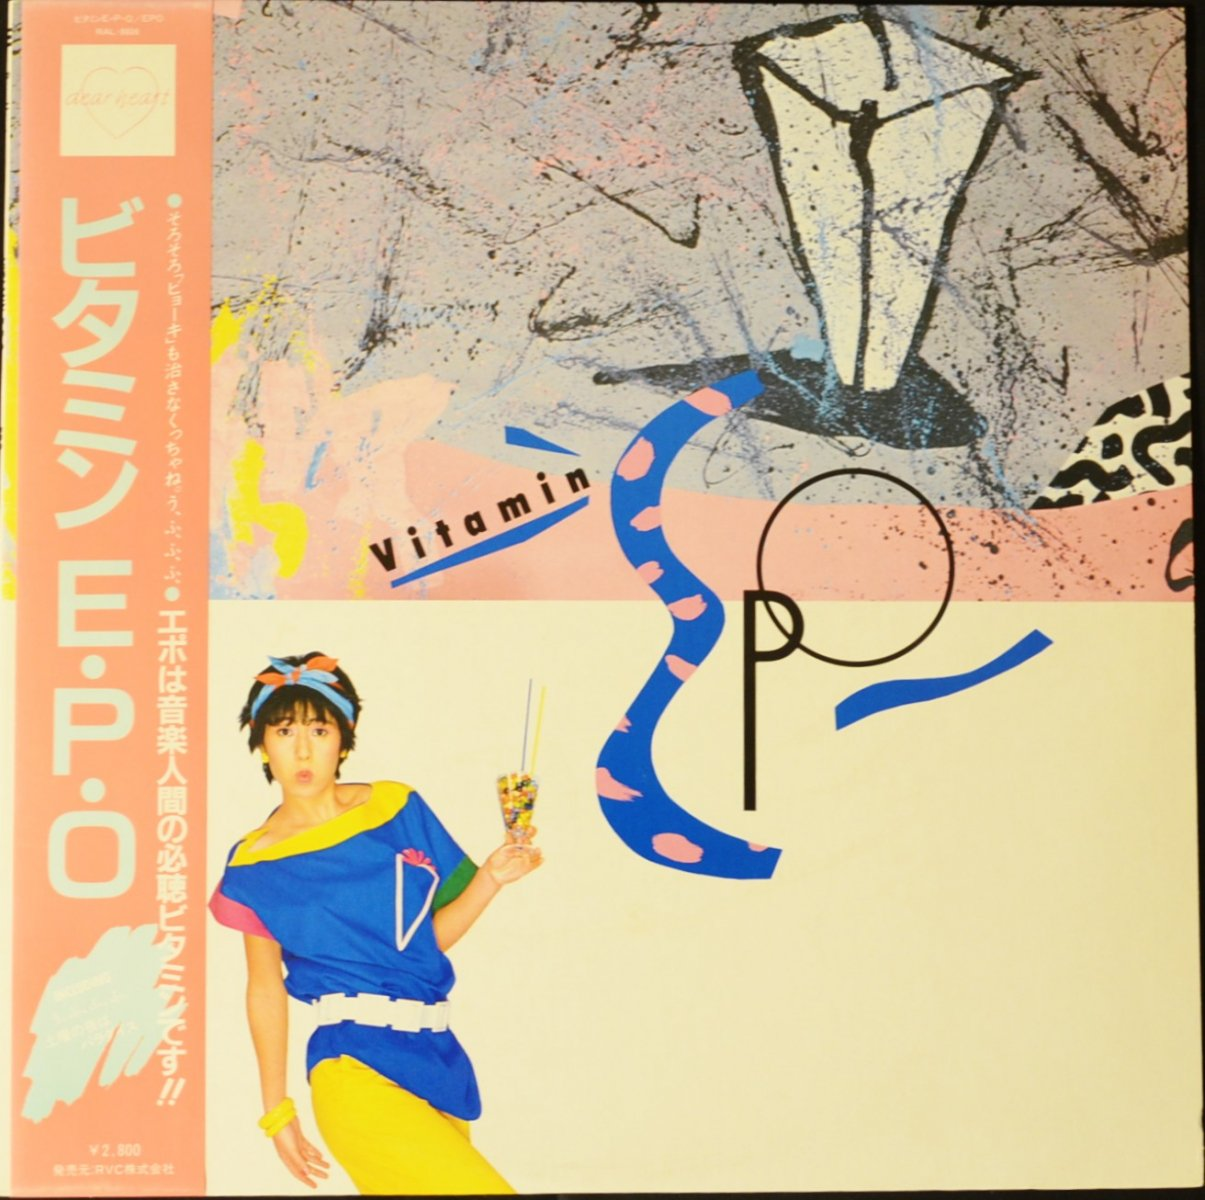 エポ EPO / ビタミン E・P・O / VITAMIN E・P・O (LP)